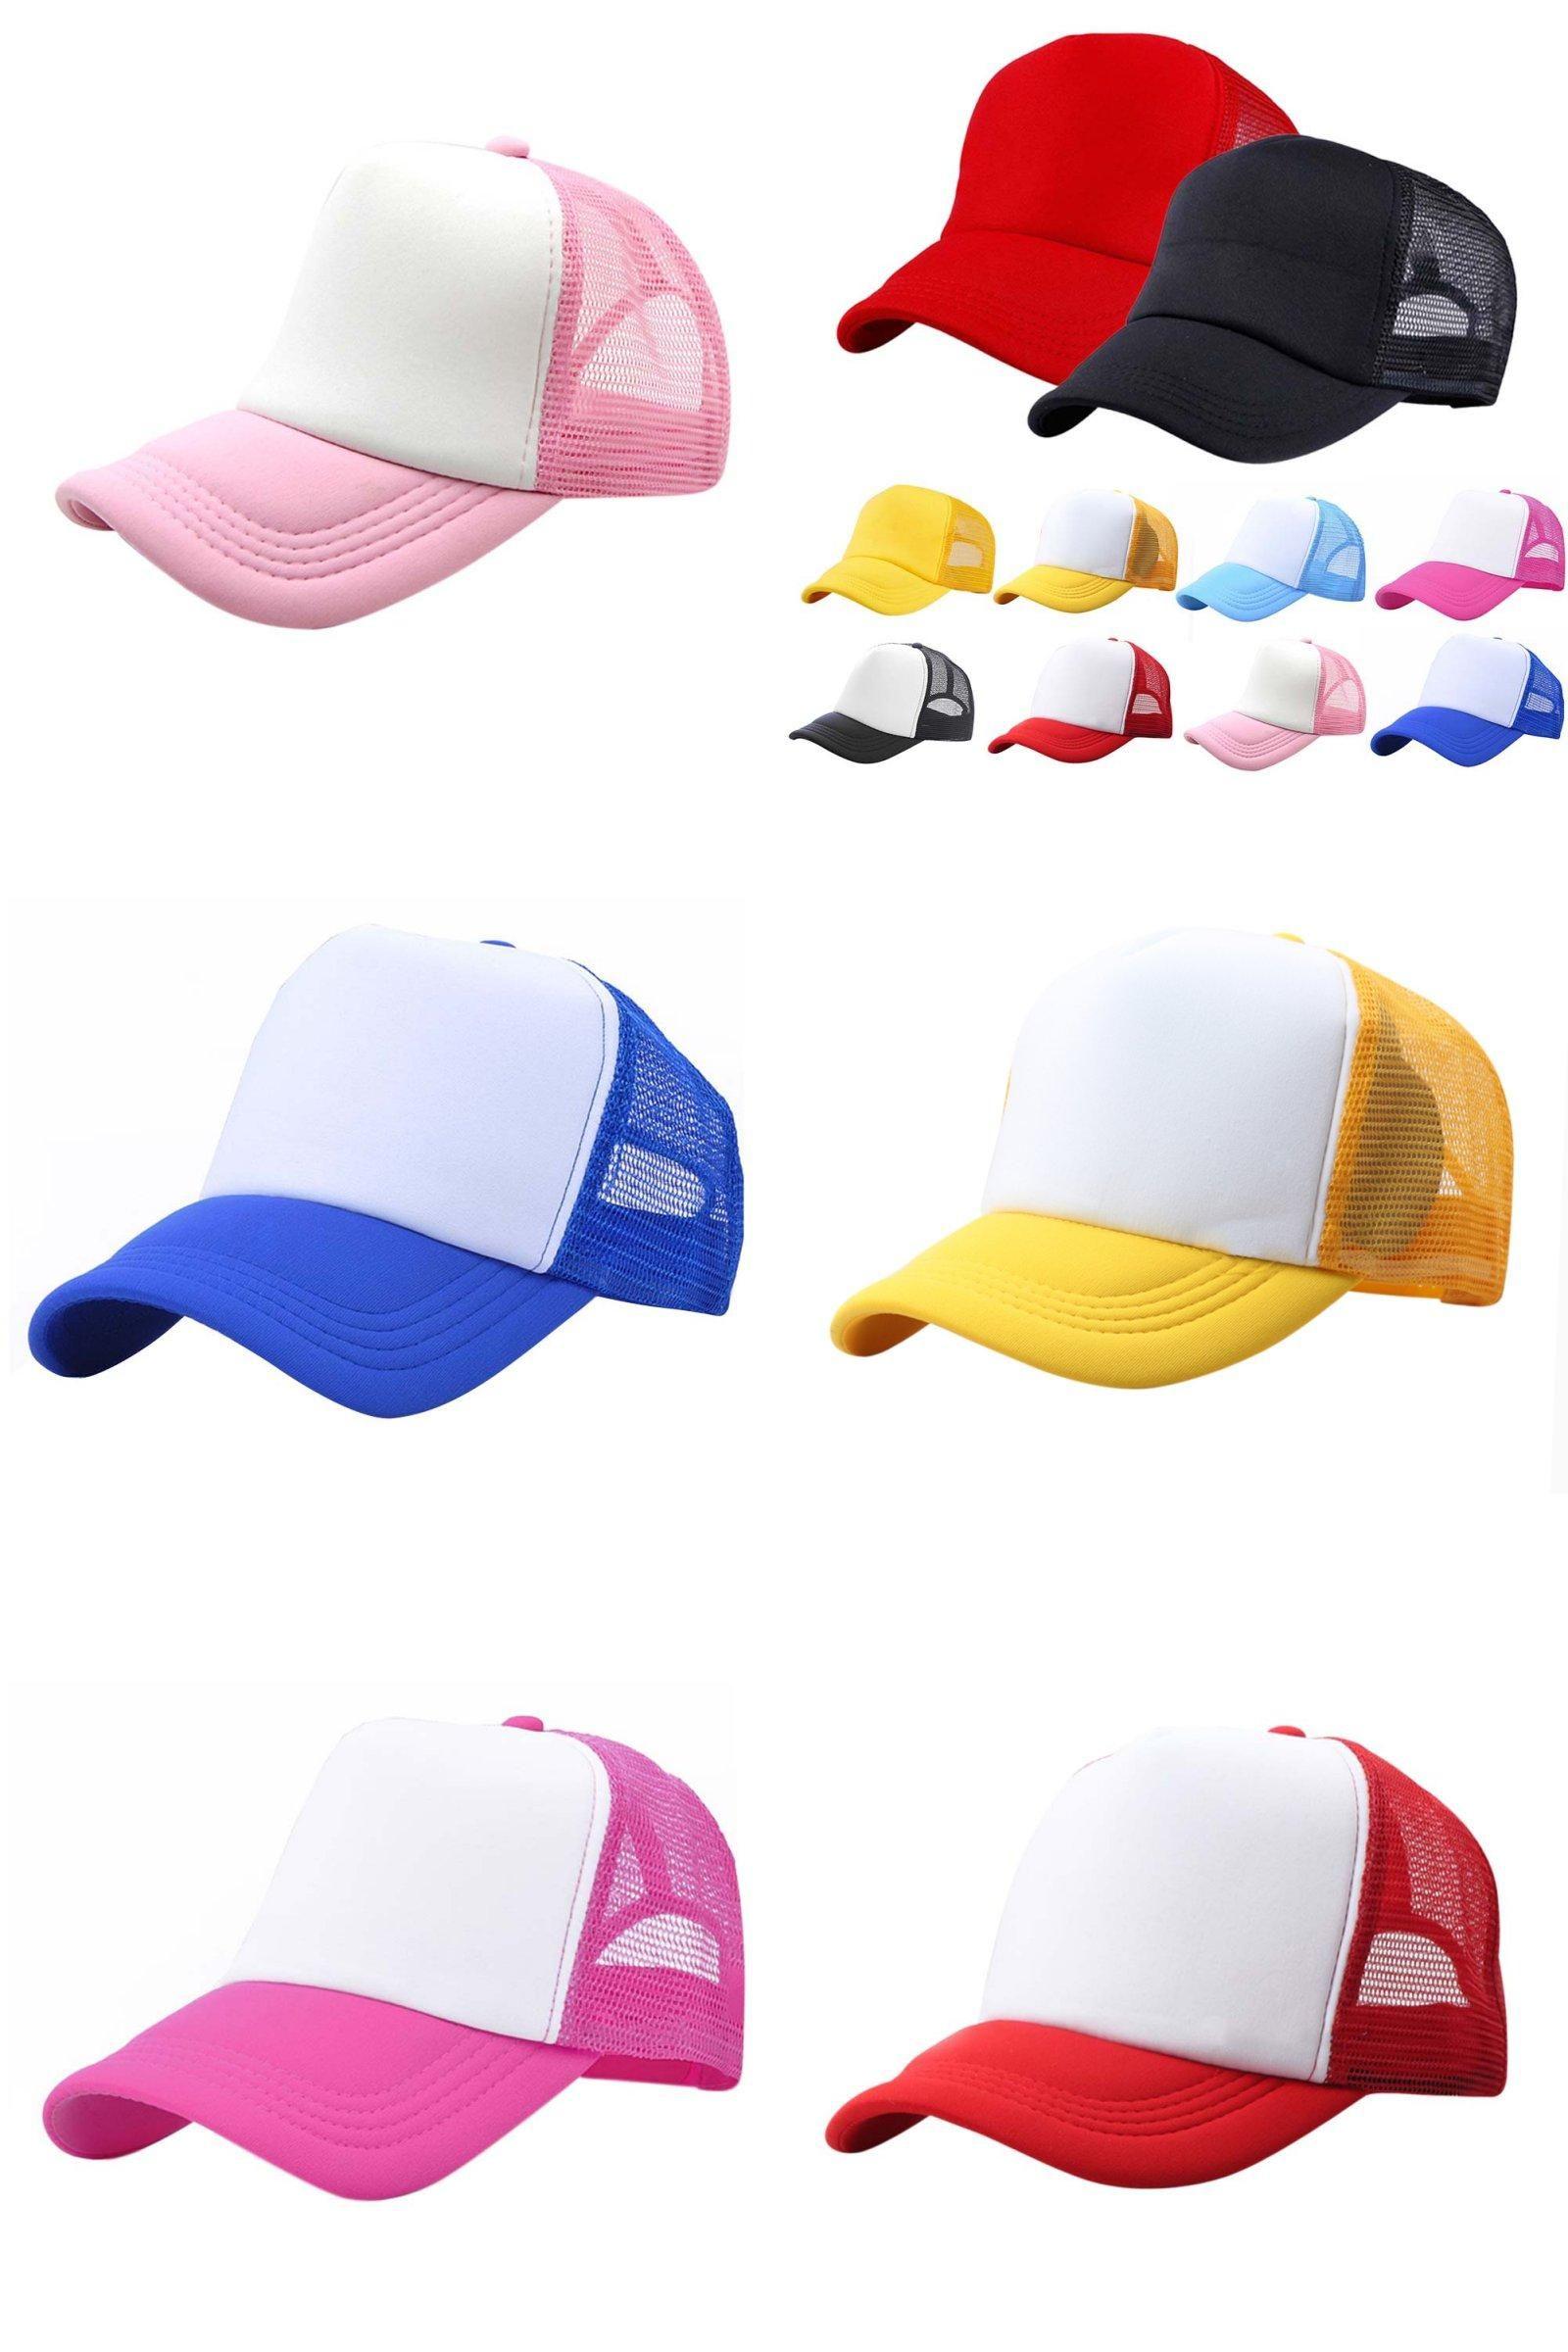 c0c5d872a32  Visit to Buy  Baby Boys Girls Children Toddler Infant Hat Peaked Cap  Baseball Hats